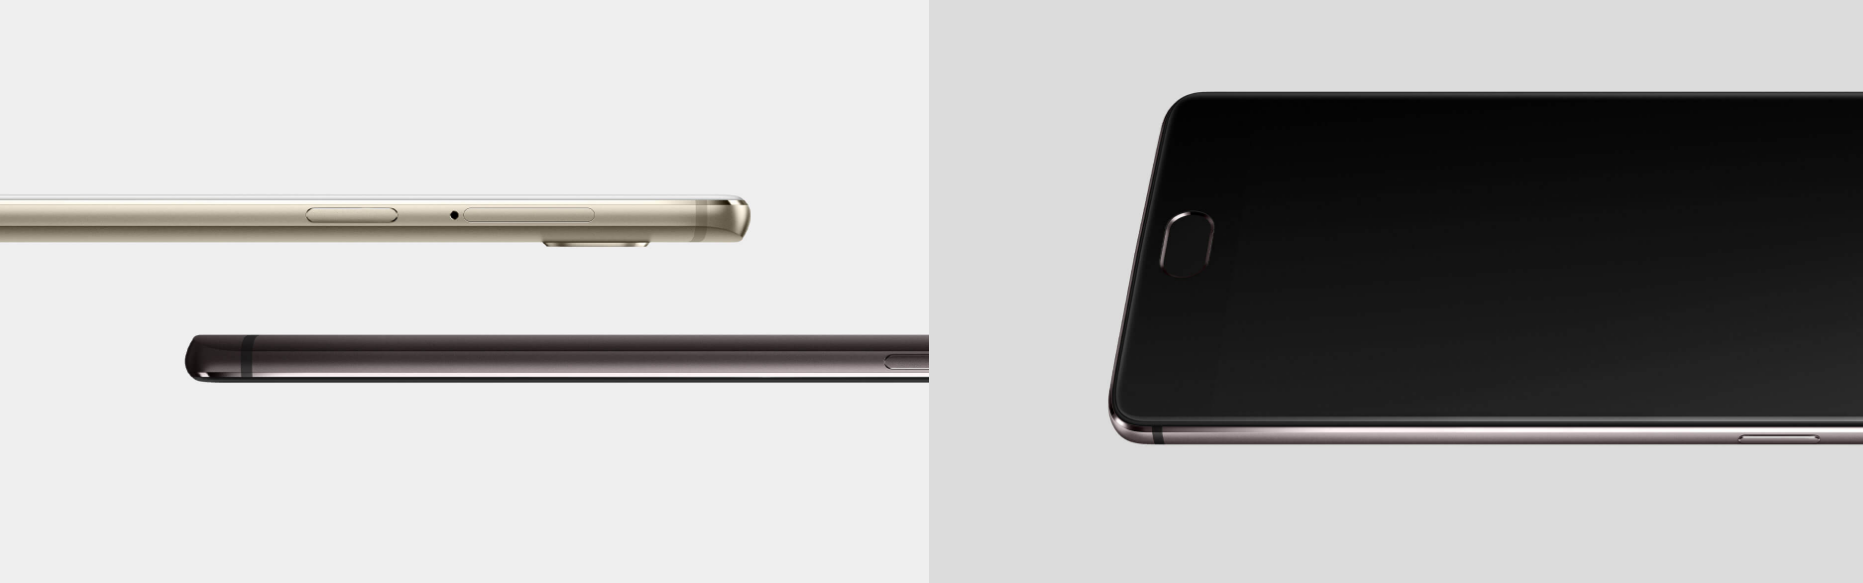 OnePlus3t diseño